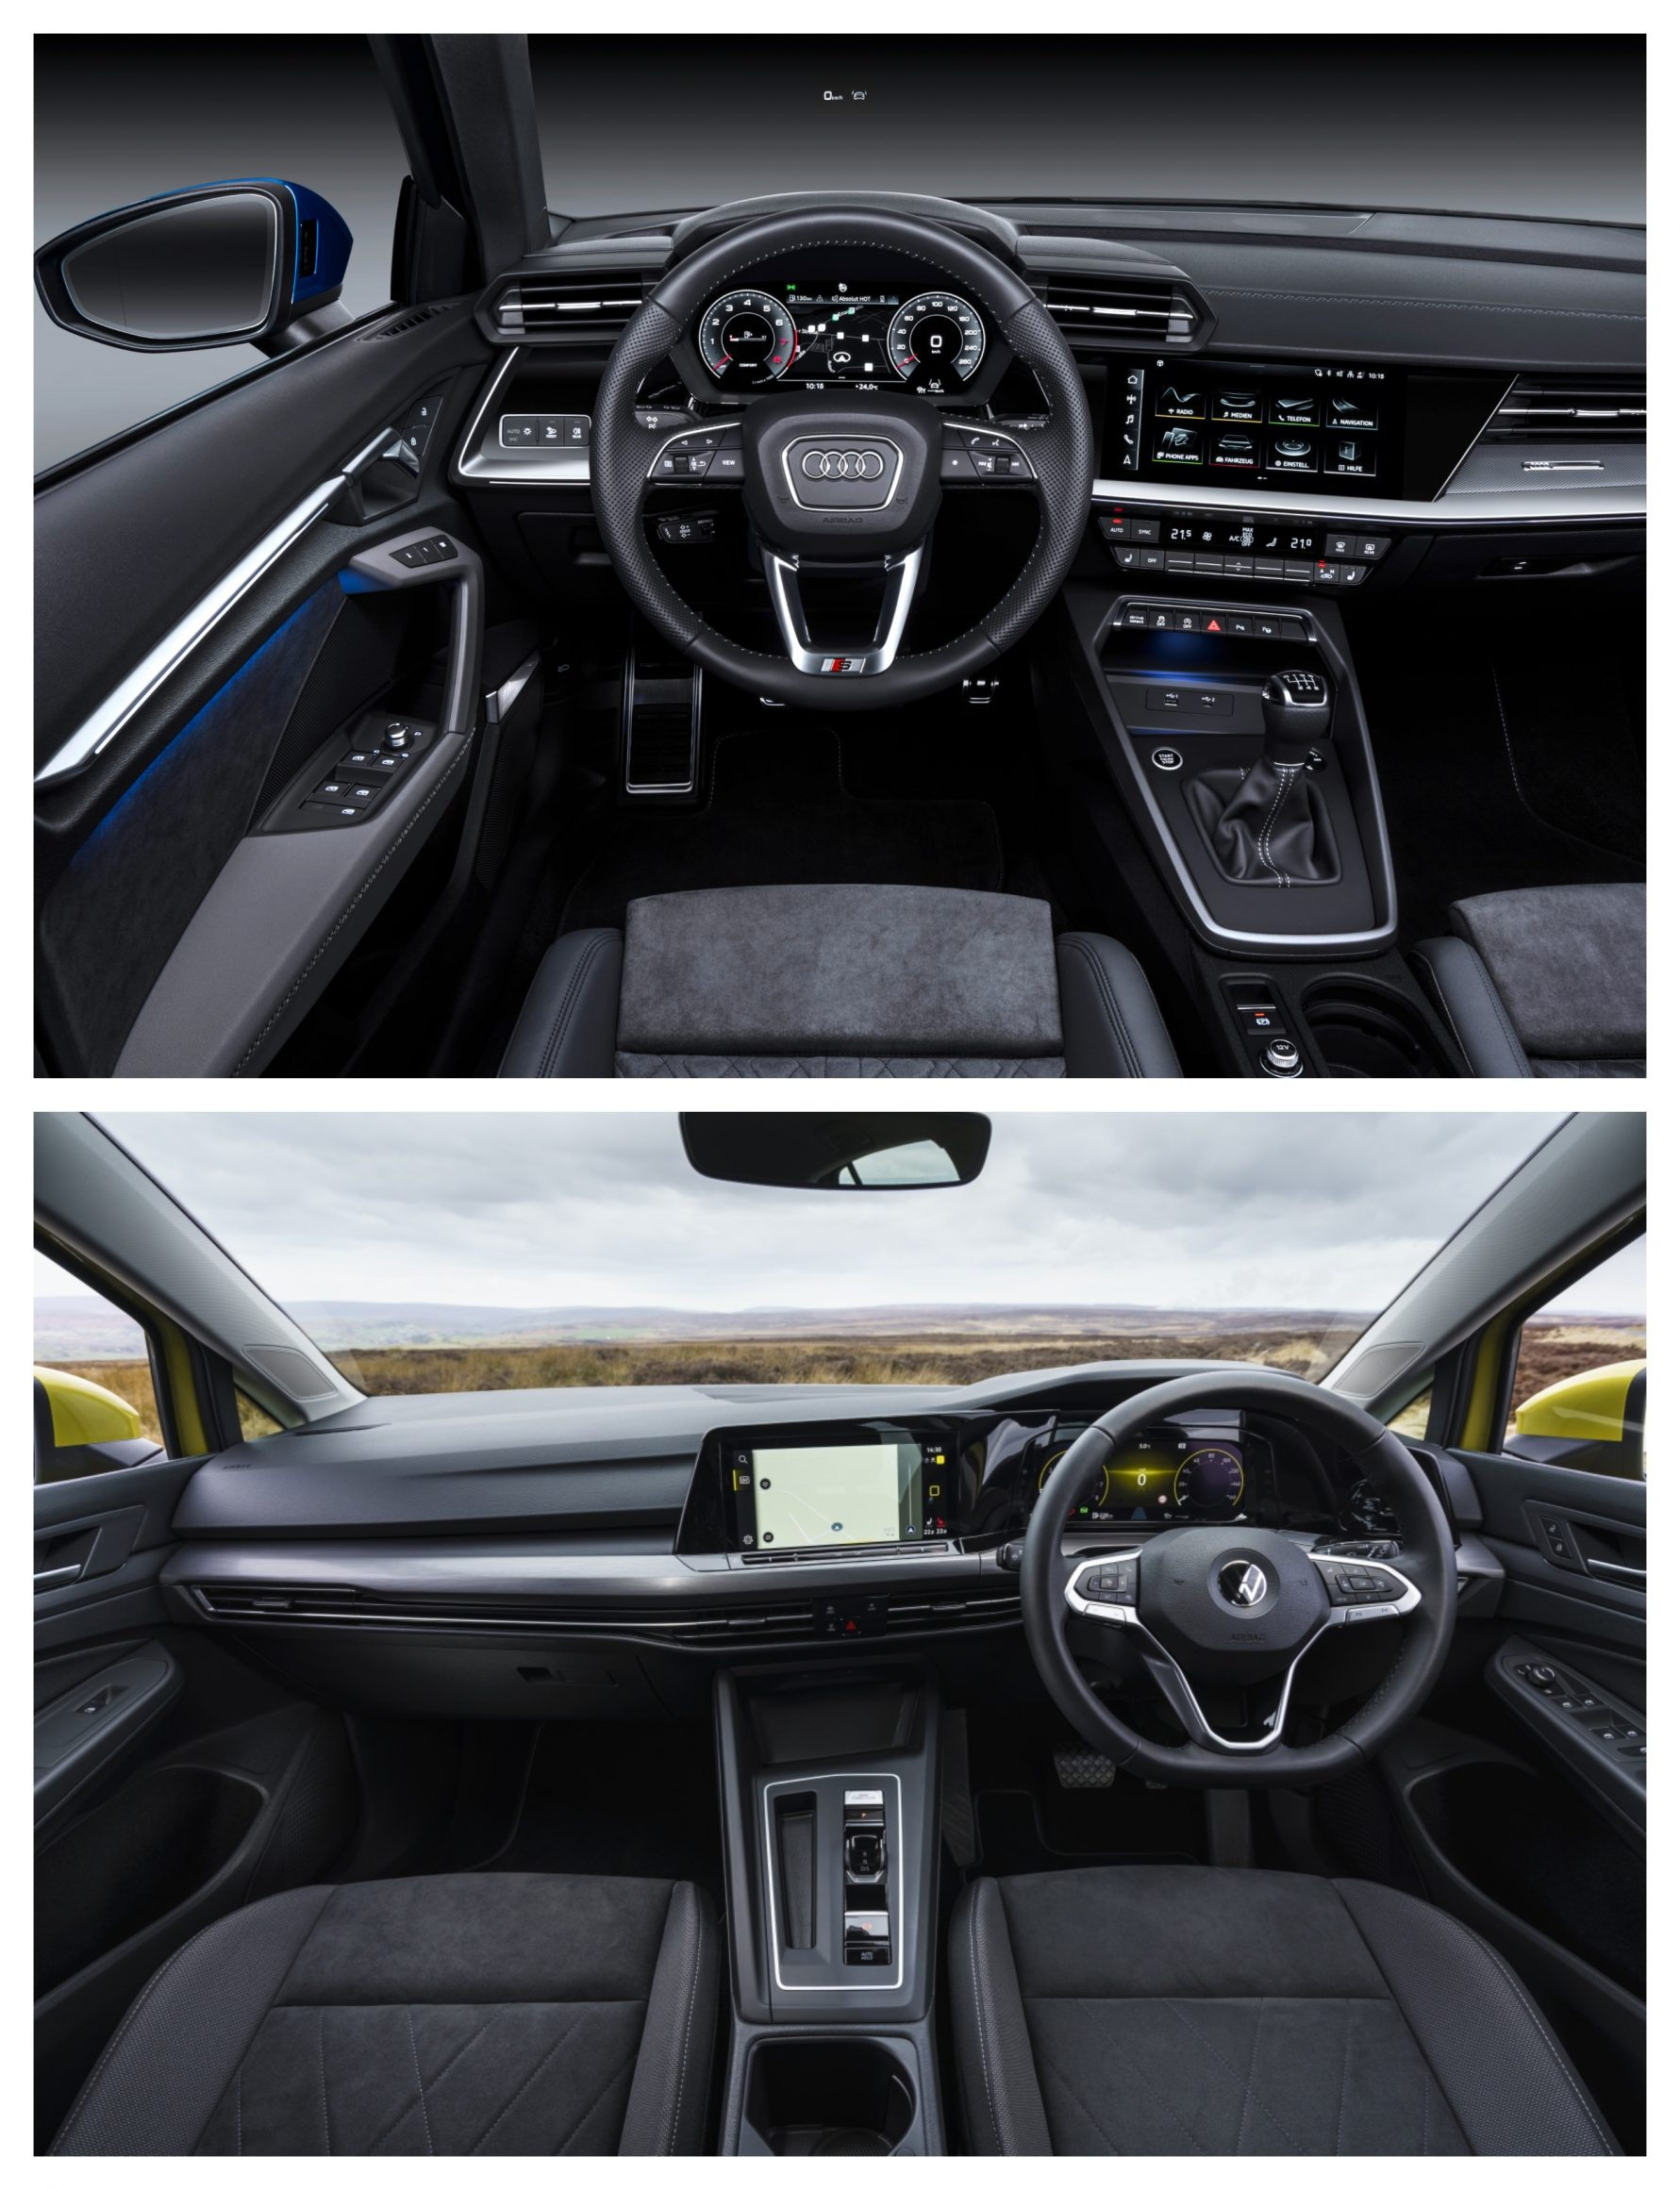 Audi A3 Vs Volkswagen Golf - interior design